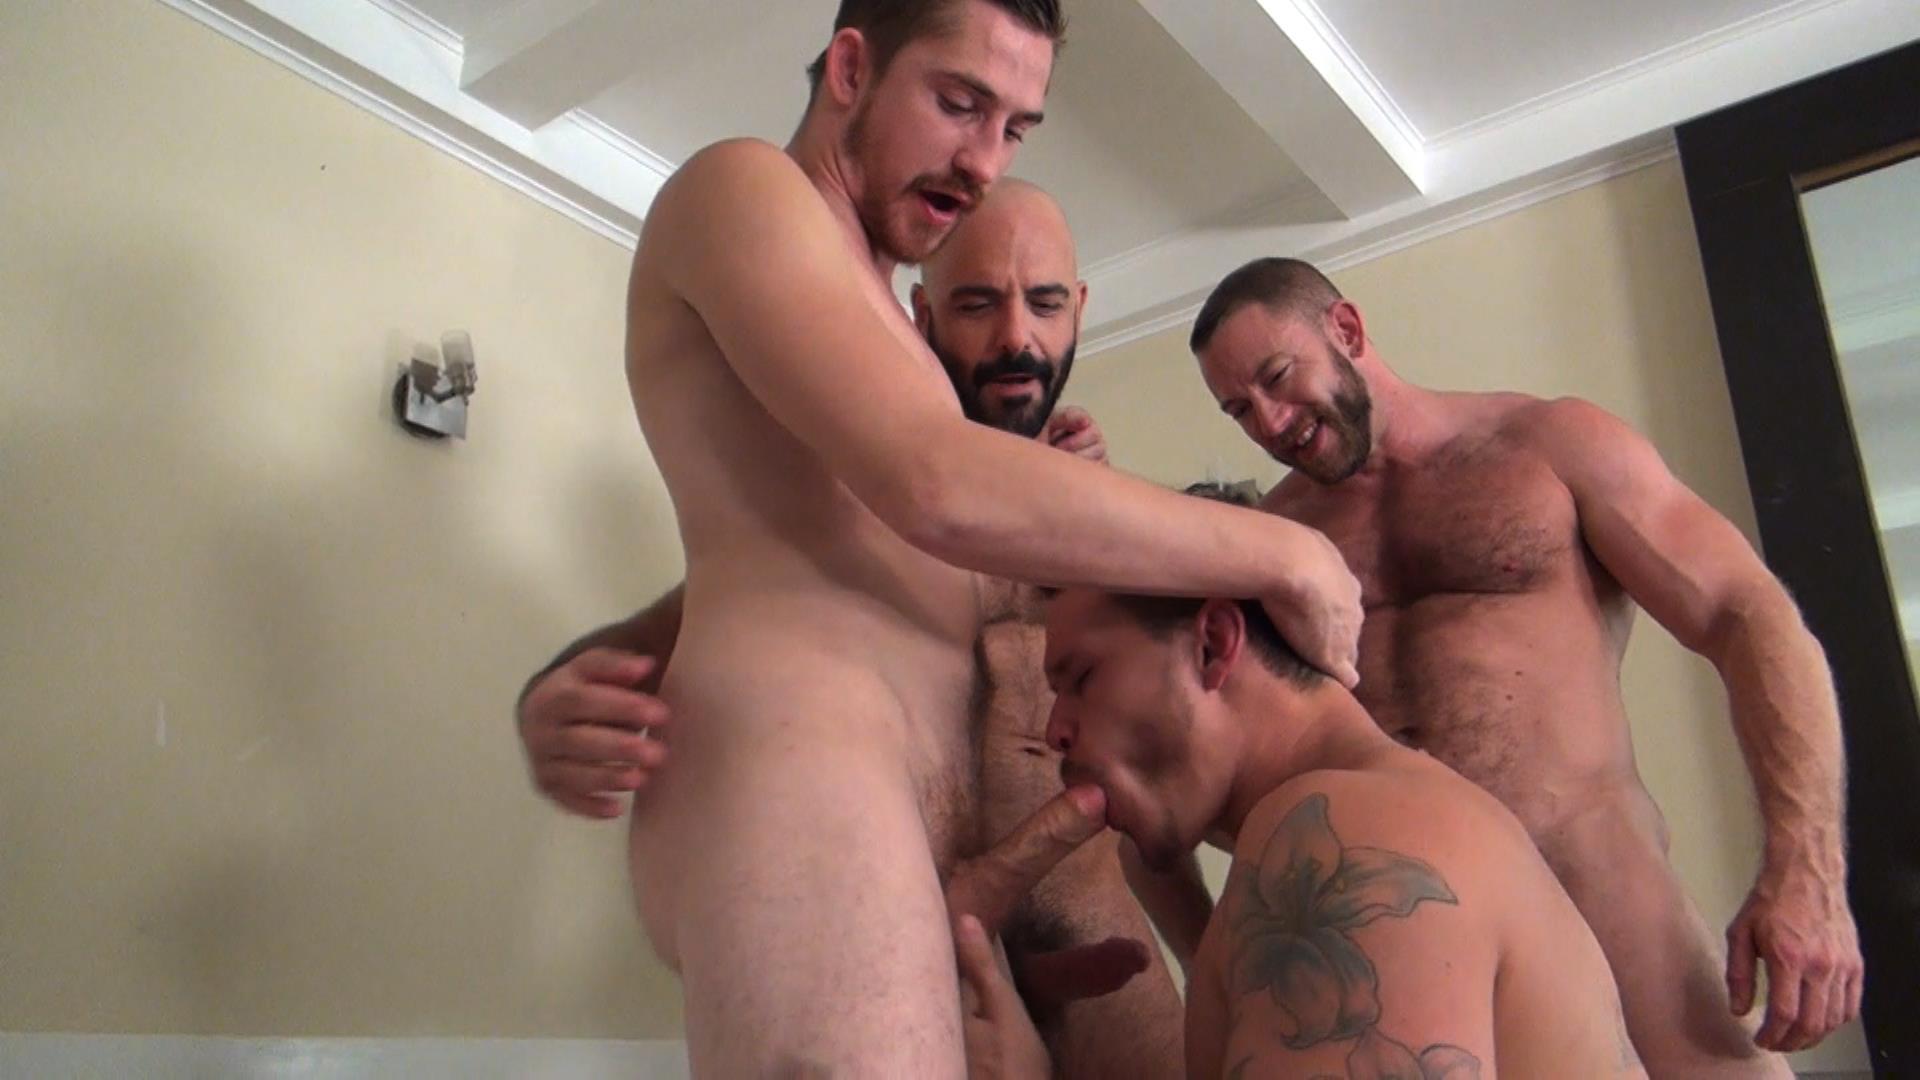 Raw-Fuck-Club-Dayton-OConnor-Tate-Ryder-Shay-Michaels-Adam-Russo-Bareback-Breeding-Amateur-Gay-Porn-4 Tate Ryder Gets Three Hairy Muscle Daddy Bareback Cocks